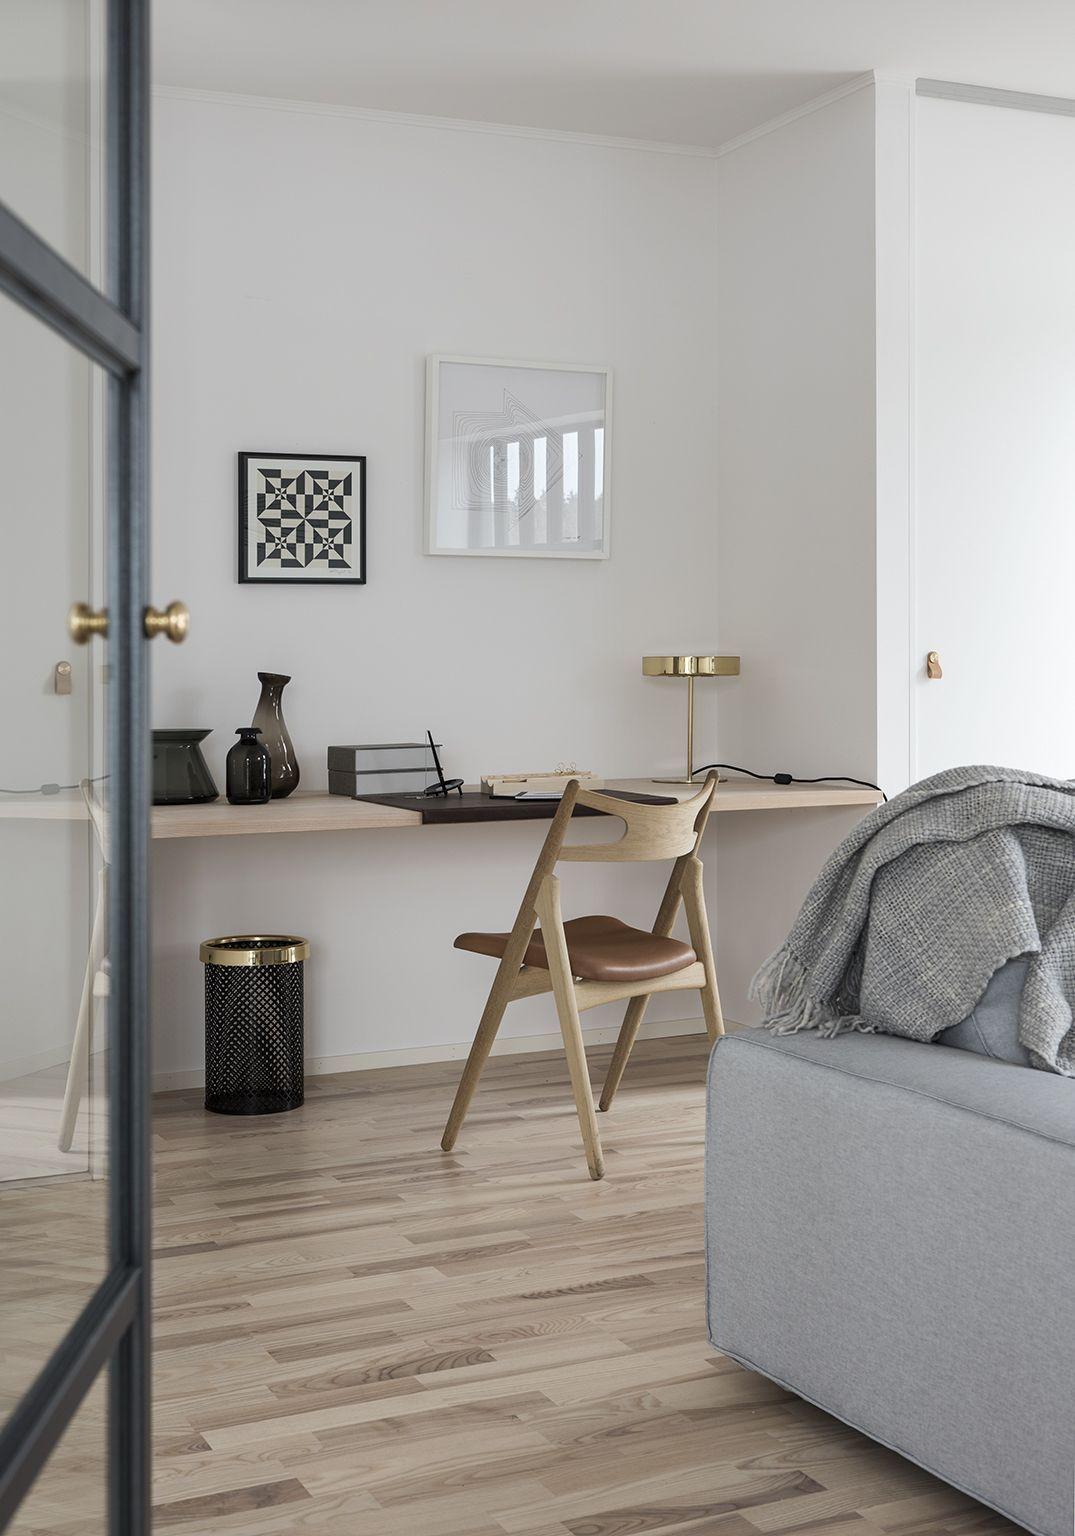 Minimalist interiors inspiration for my new house interior ideas interior trends interior design